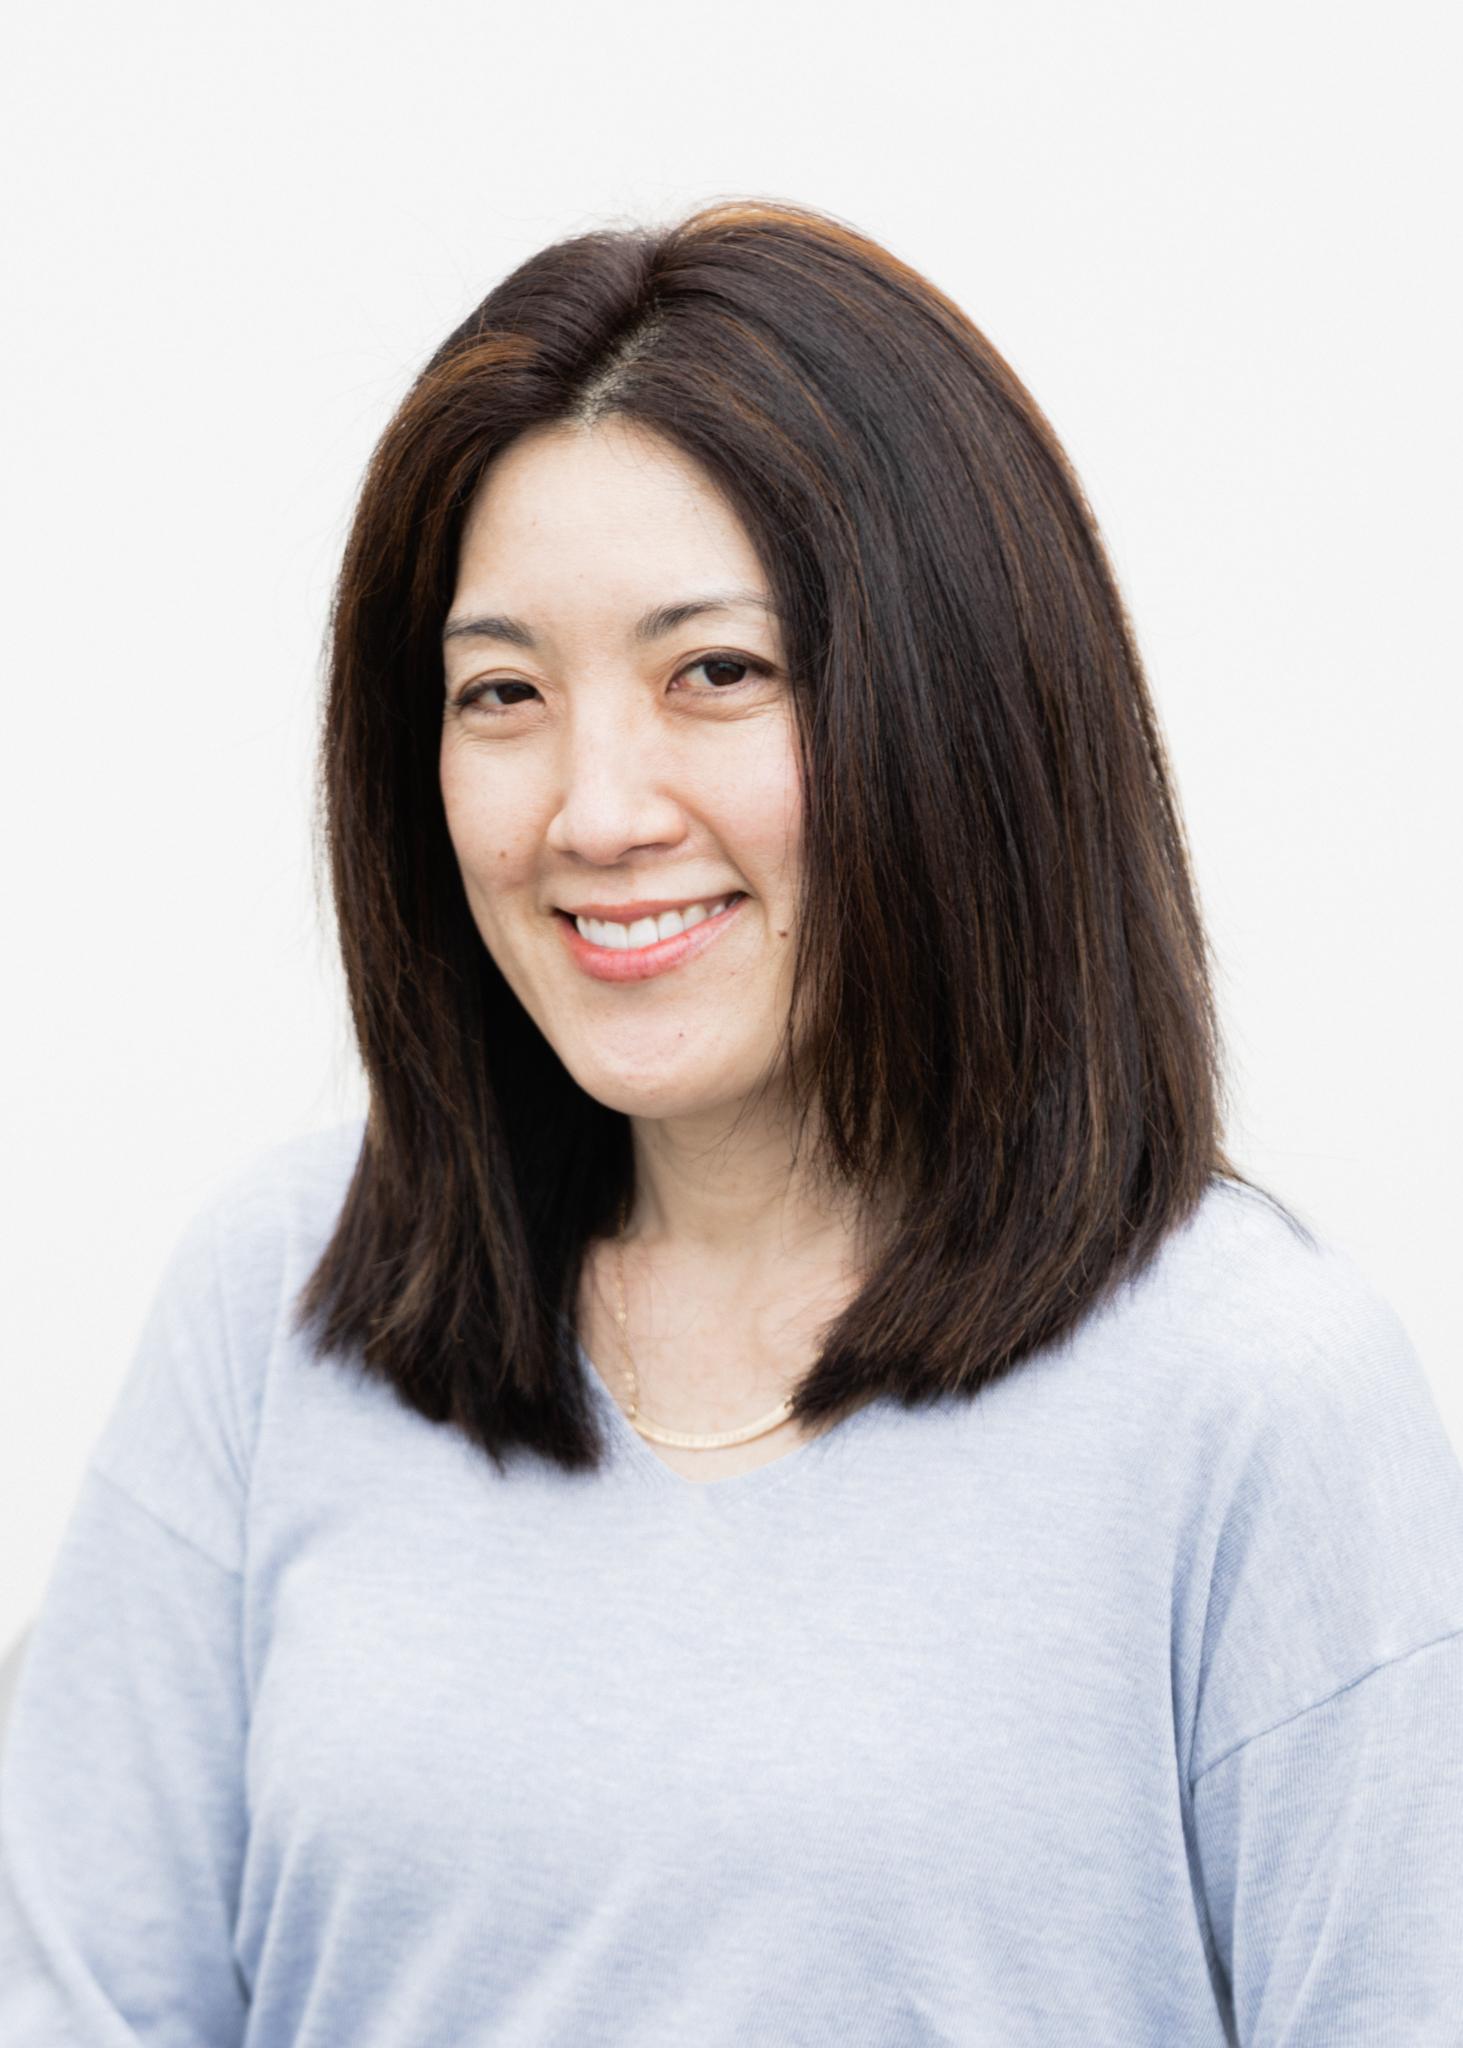 Nicole Kosobayashi